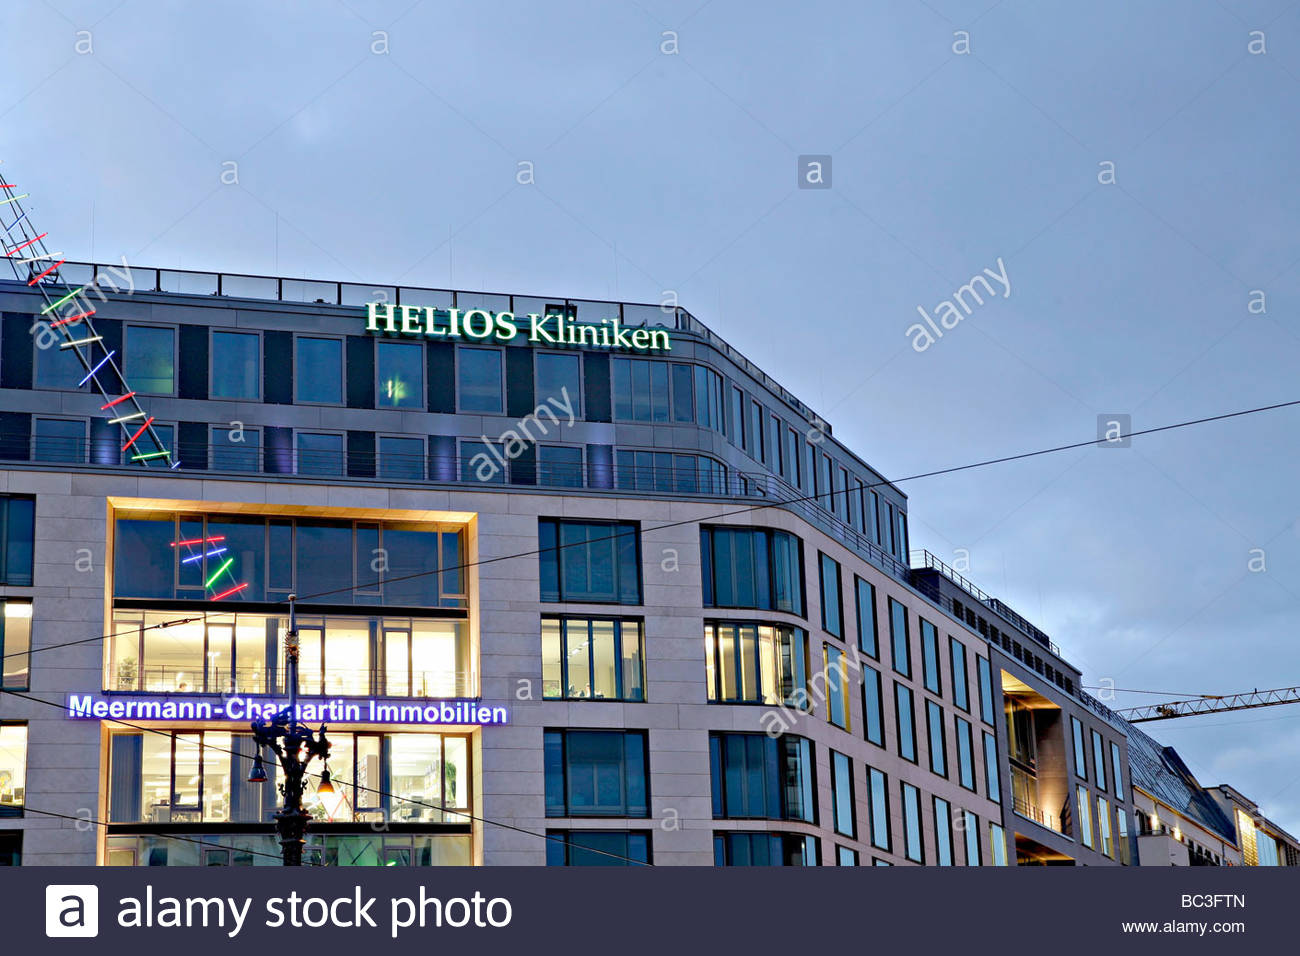 Helios Kliniken De